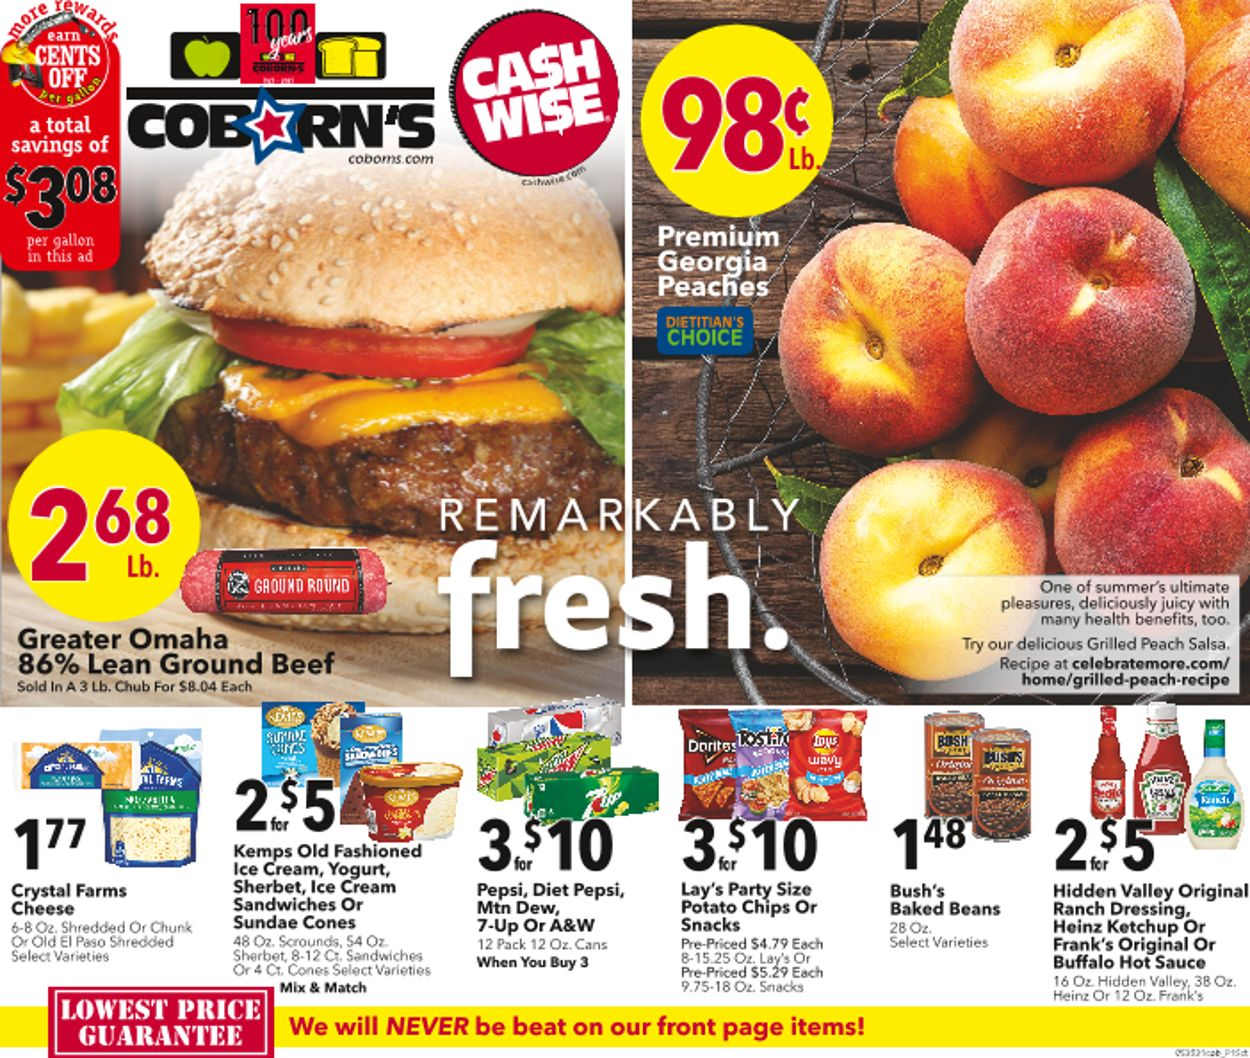 Coborn's Weekly Ad Circular - valid 05/26-06/01/2021